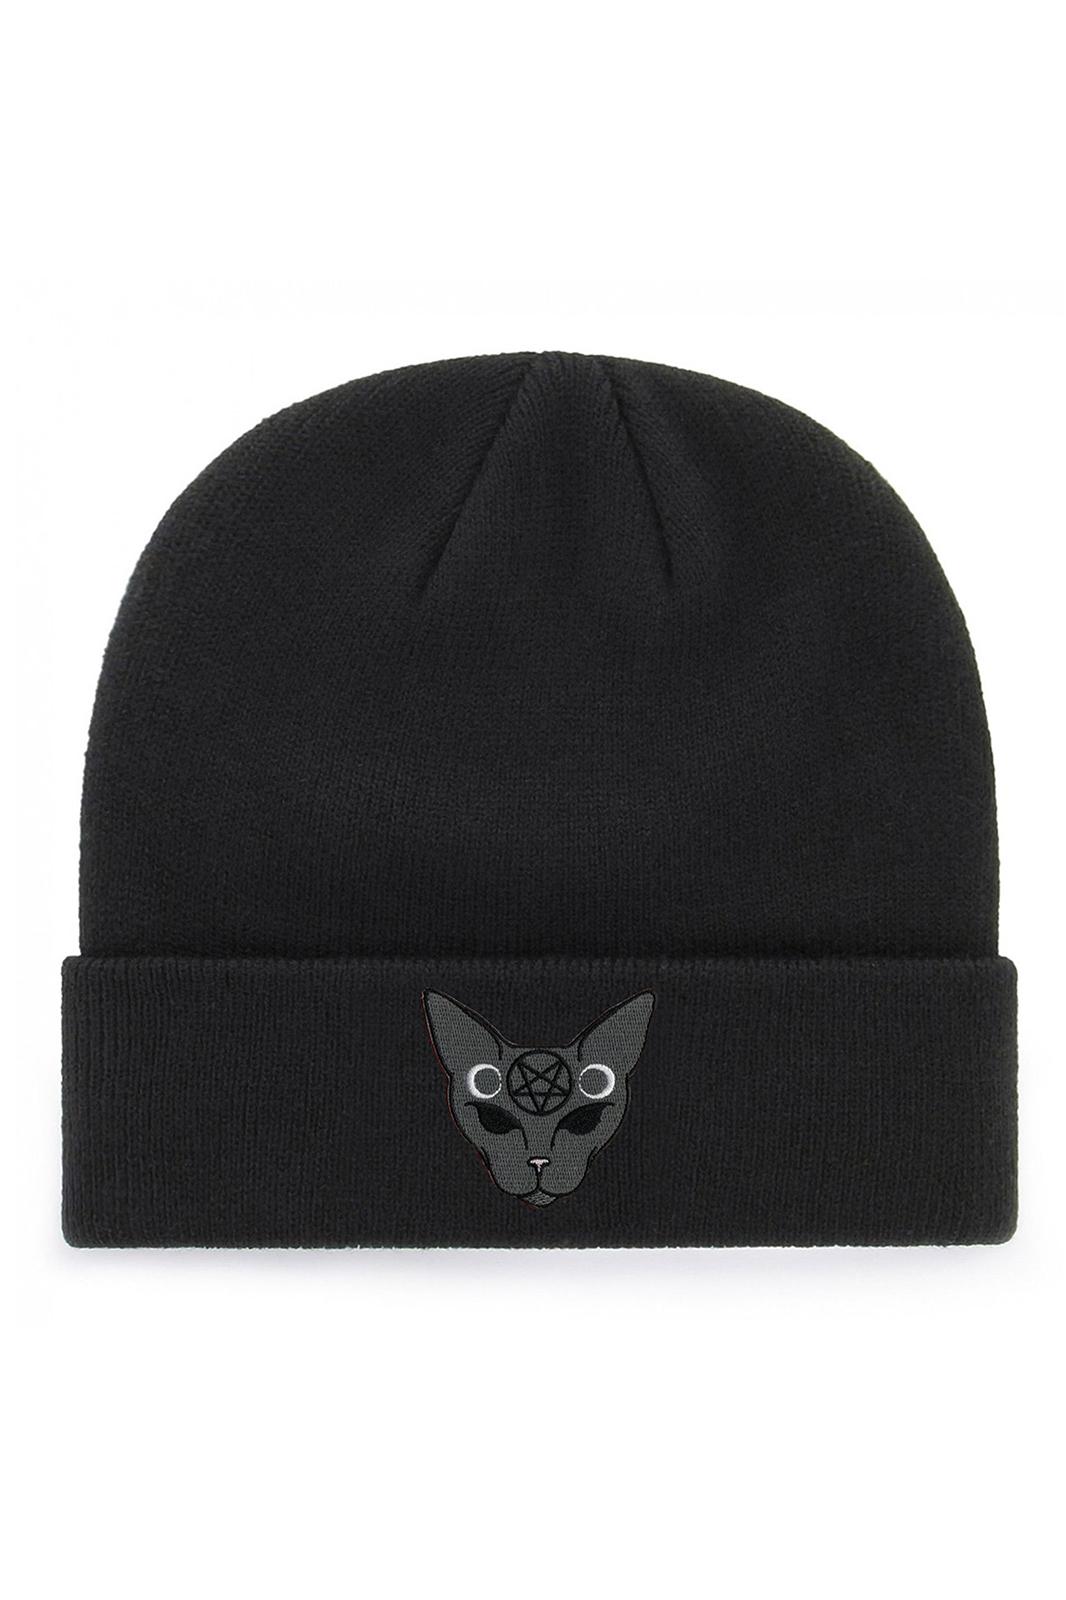 Gothic Cat Beanie